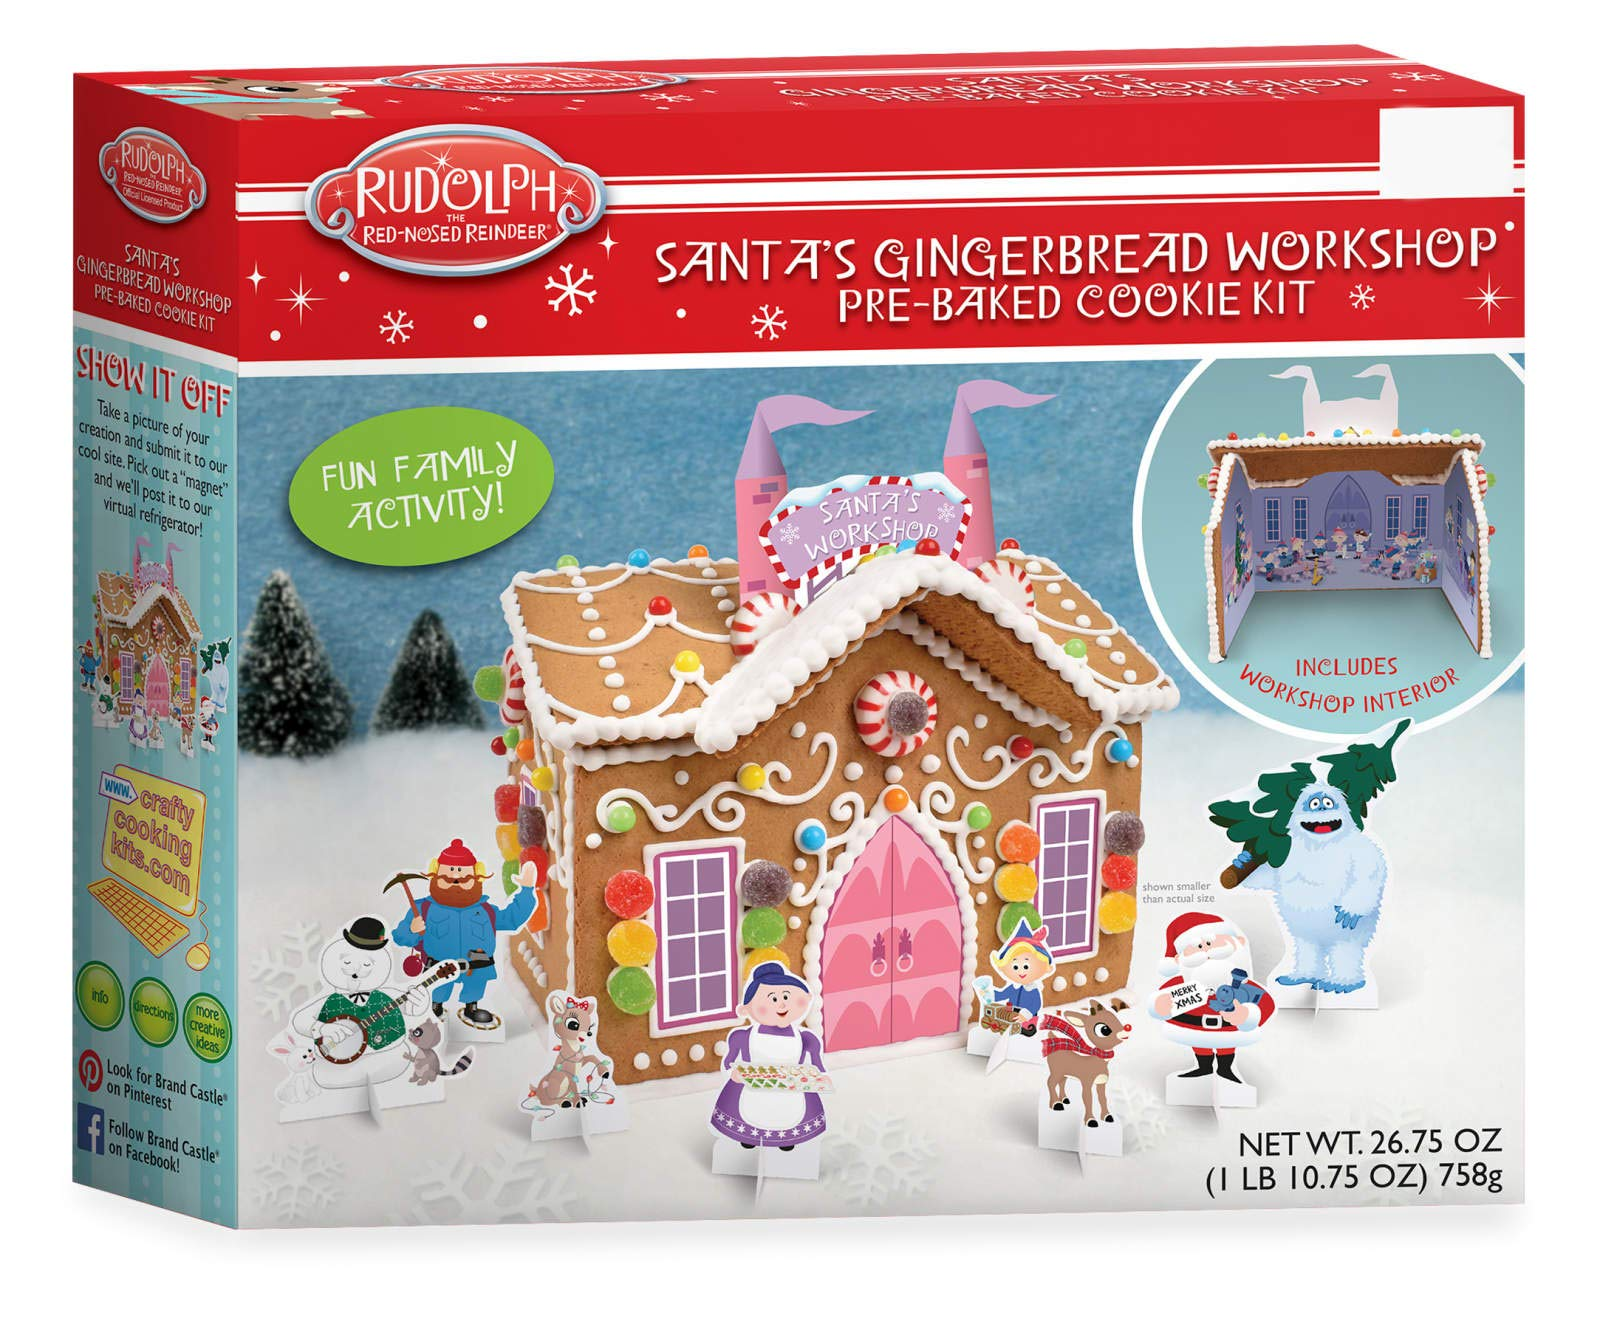 Santa's Workshop Holiday Gingerbread Cookie Kit - 26.75 oz (1 PACK)